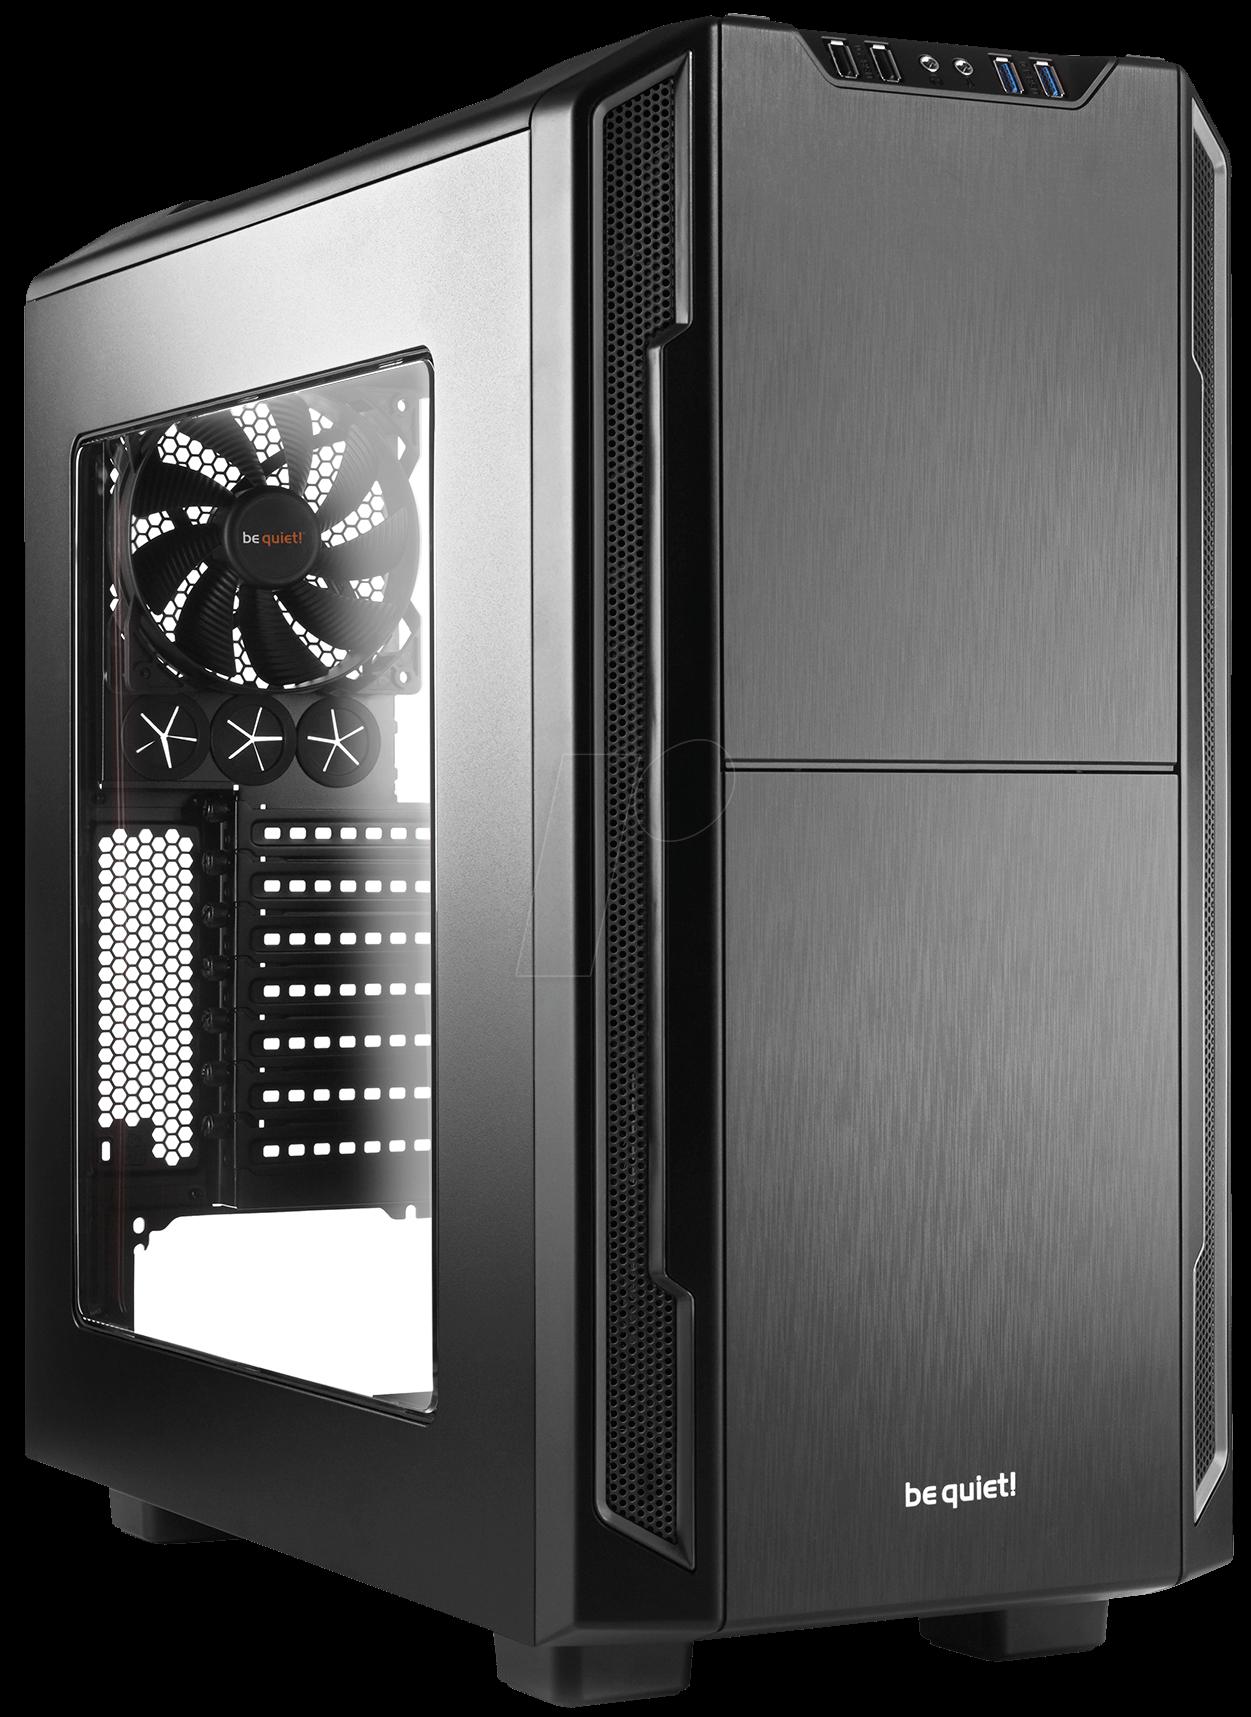 Корпус ATX BE QUIET Silent Base 600 Без БП чёрный серебристый